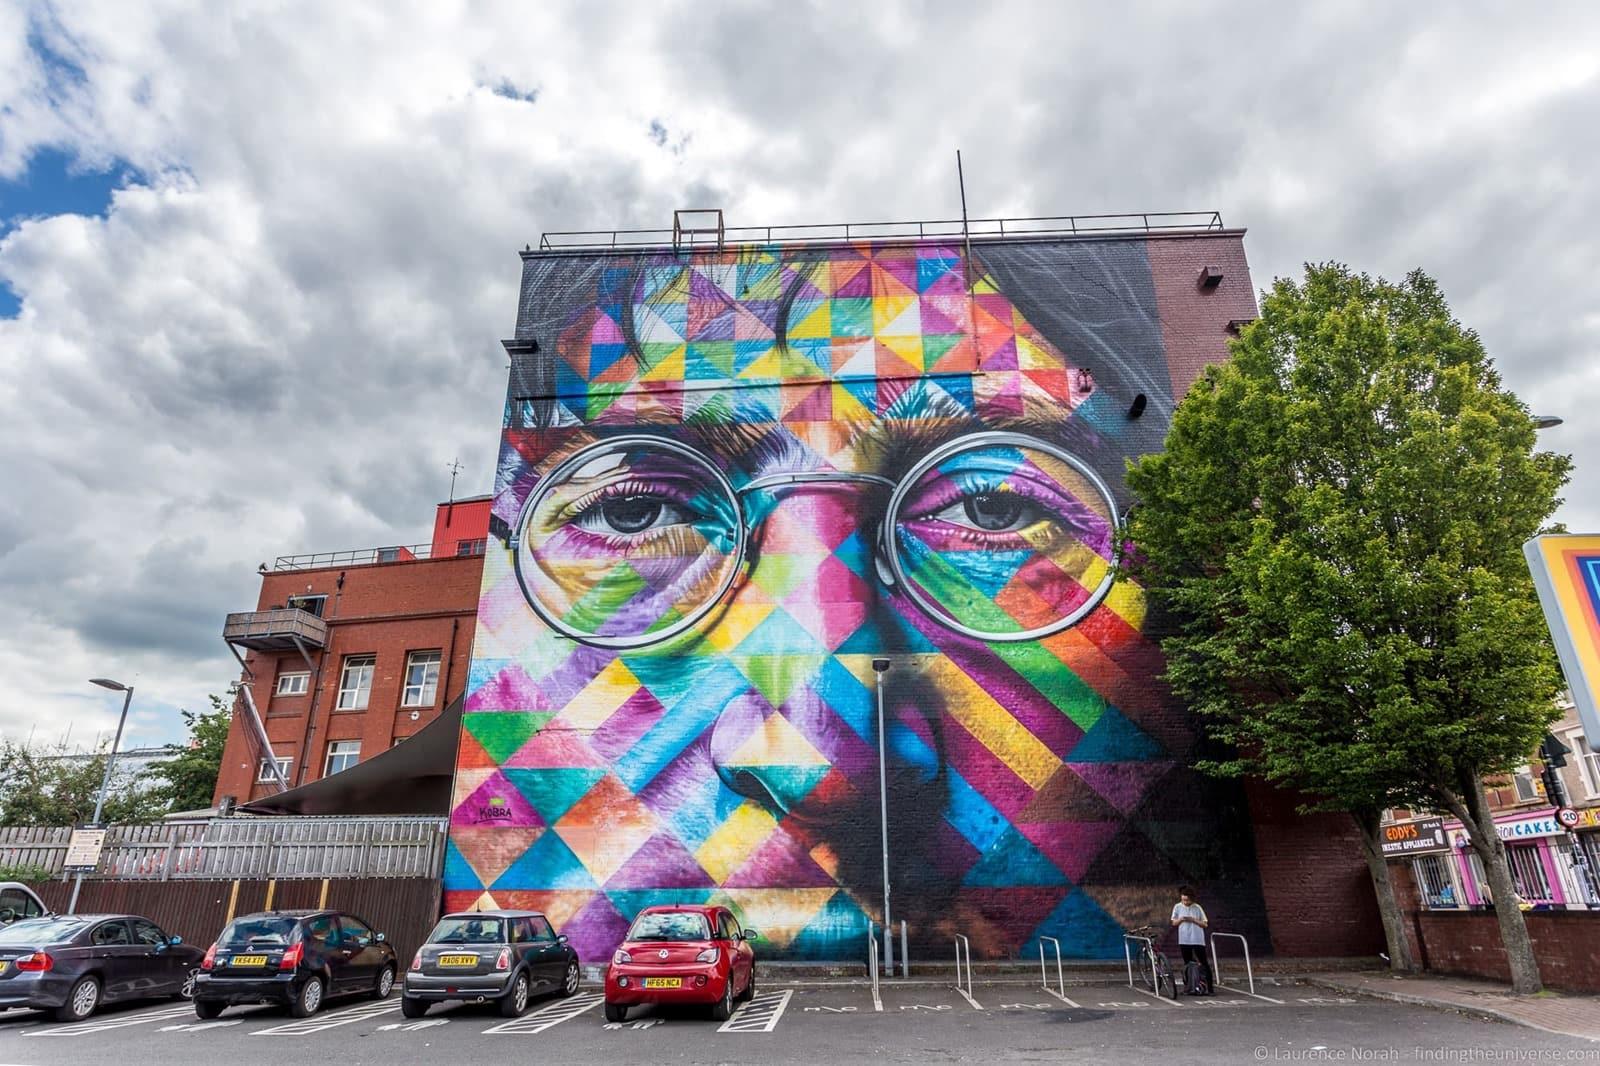 [Bristol+Street+Art_by_Laurence+Norah-5%5B4%5D]